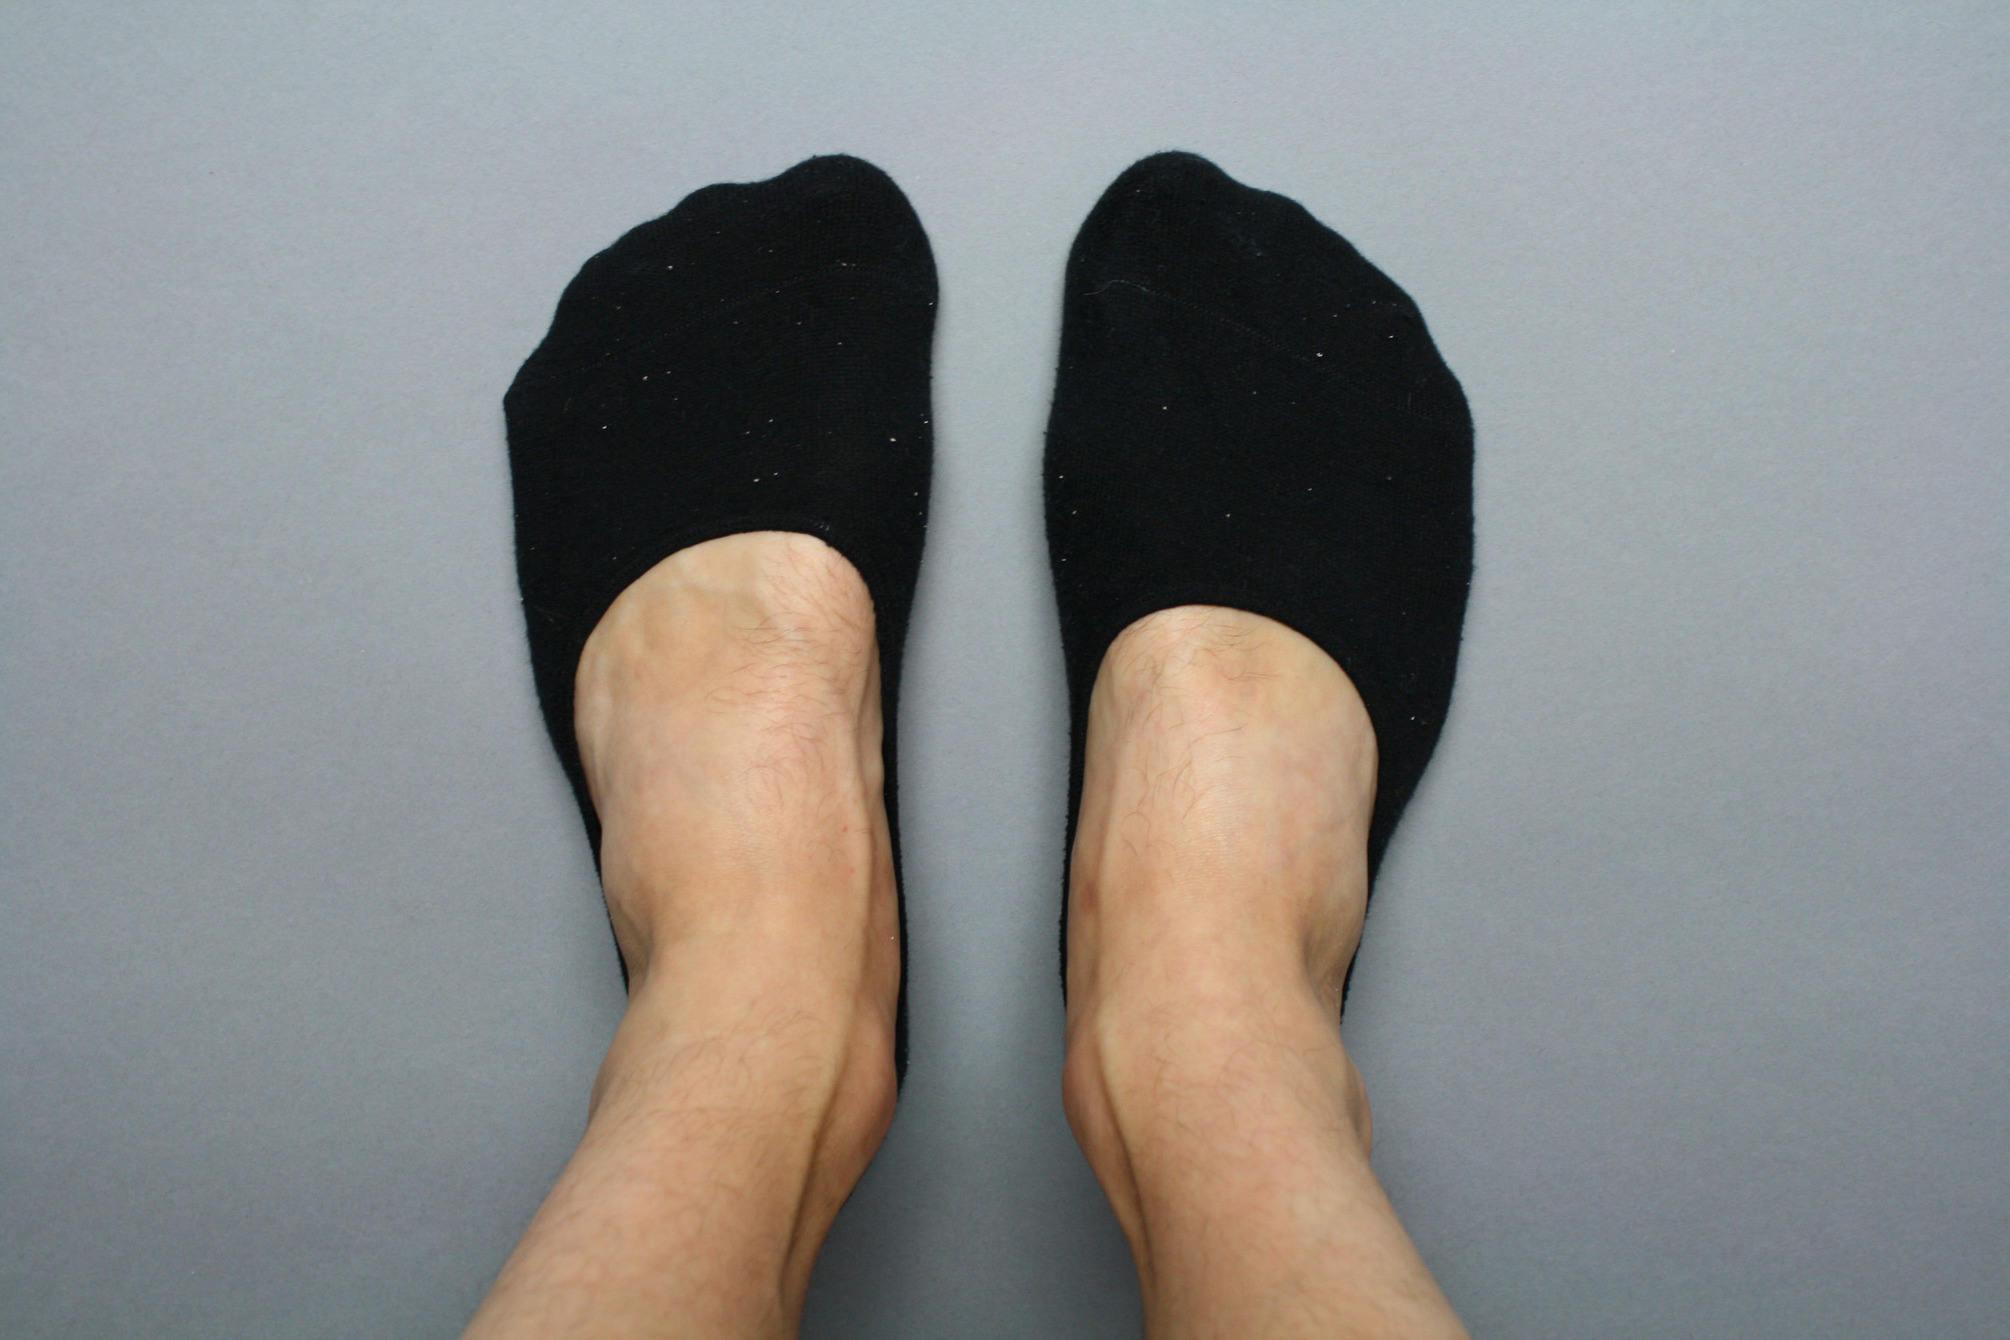 Top 13 Best No Show Socks for Men (2020 Guide)